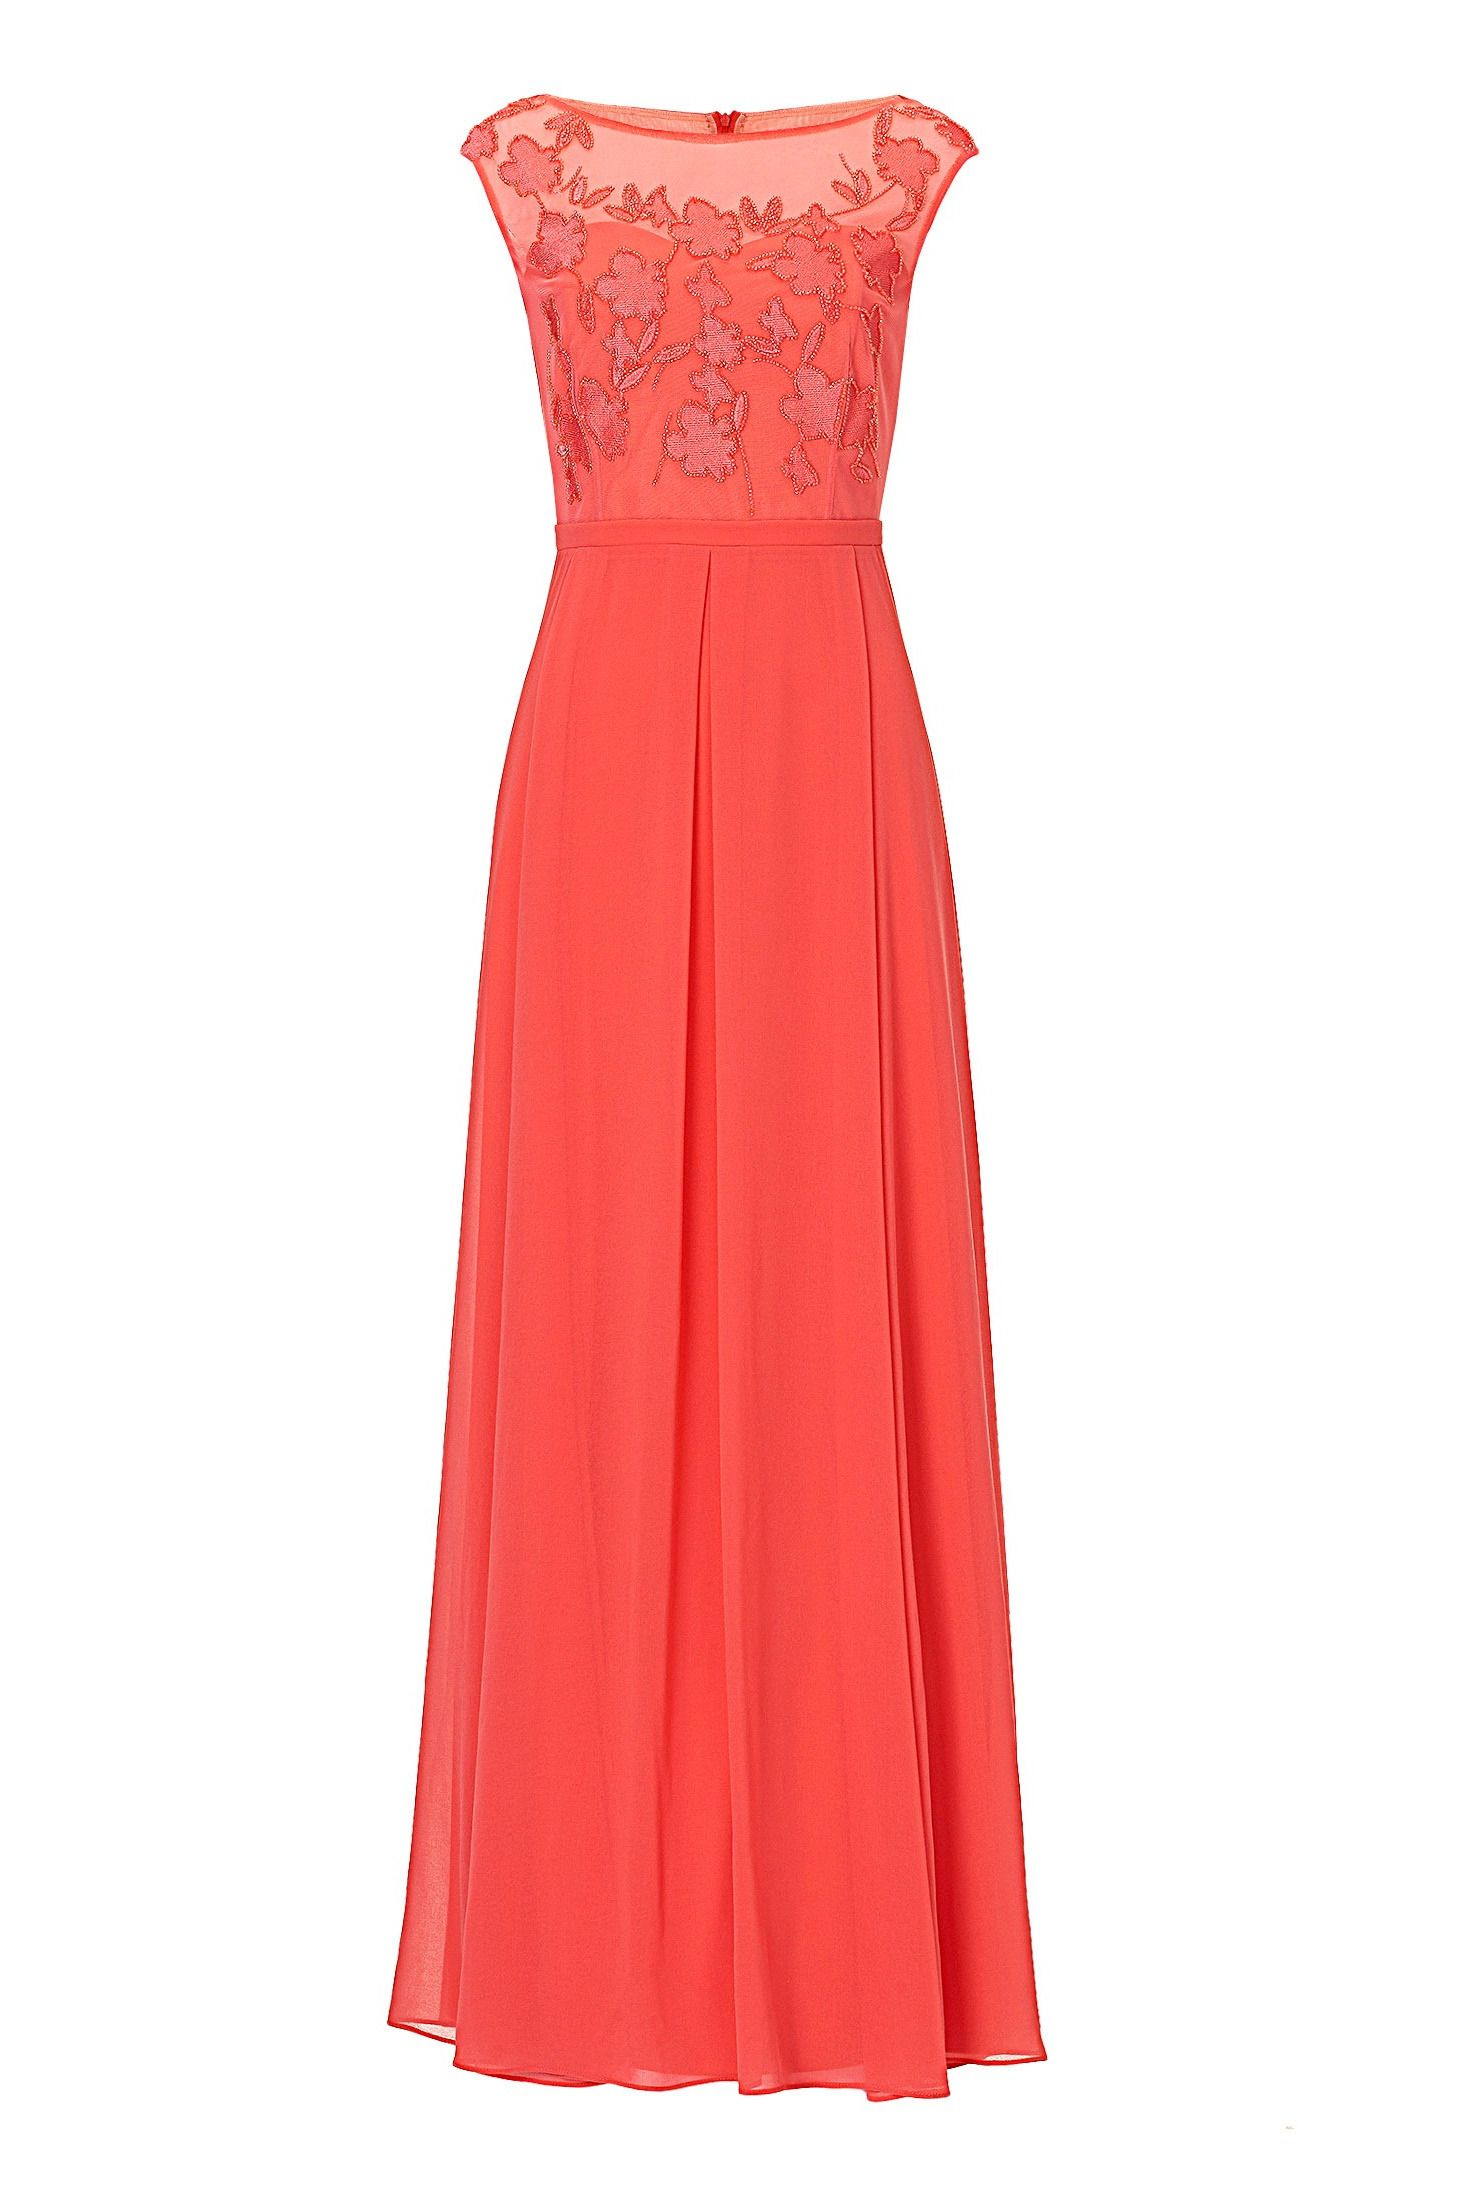 Langes Abendkleid Chiffon Koralle Vera Mont Mode Bosckens Chiffon Evening Dresses Dresses Evening Dresses Long